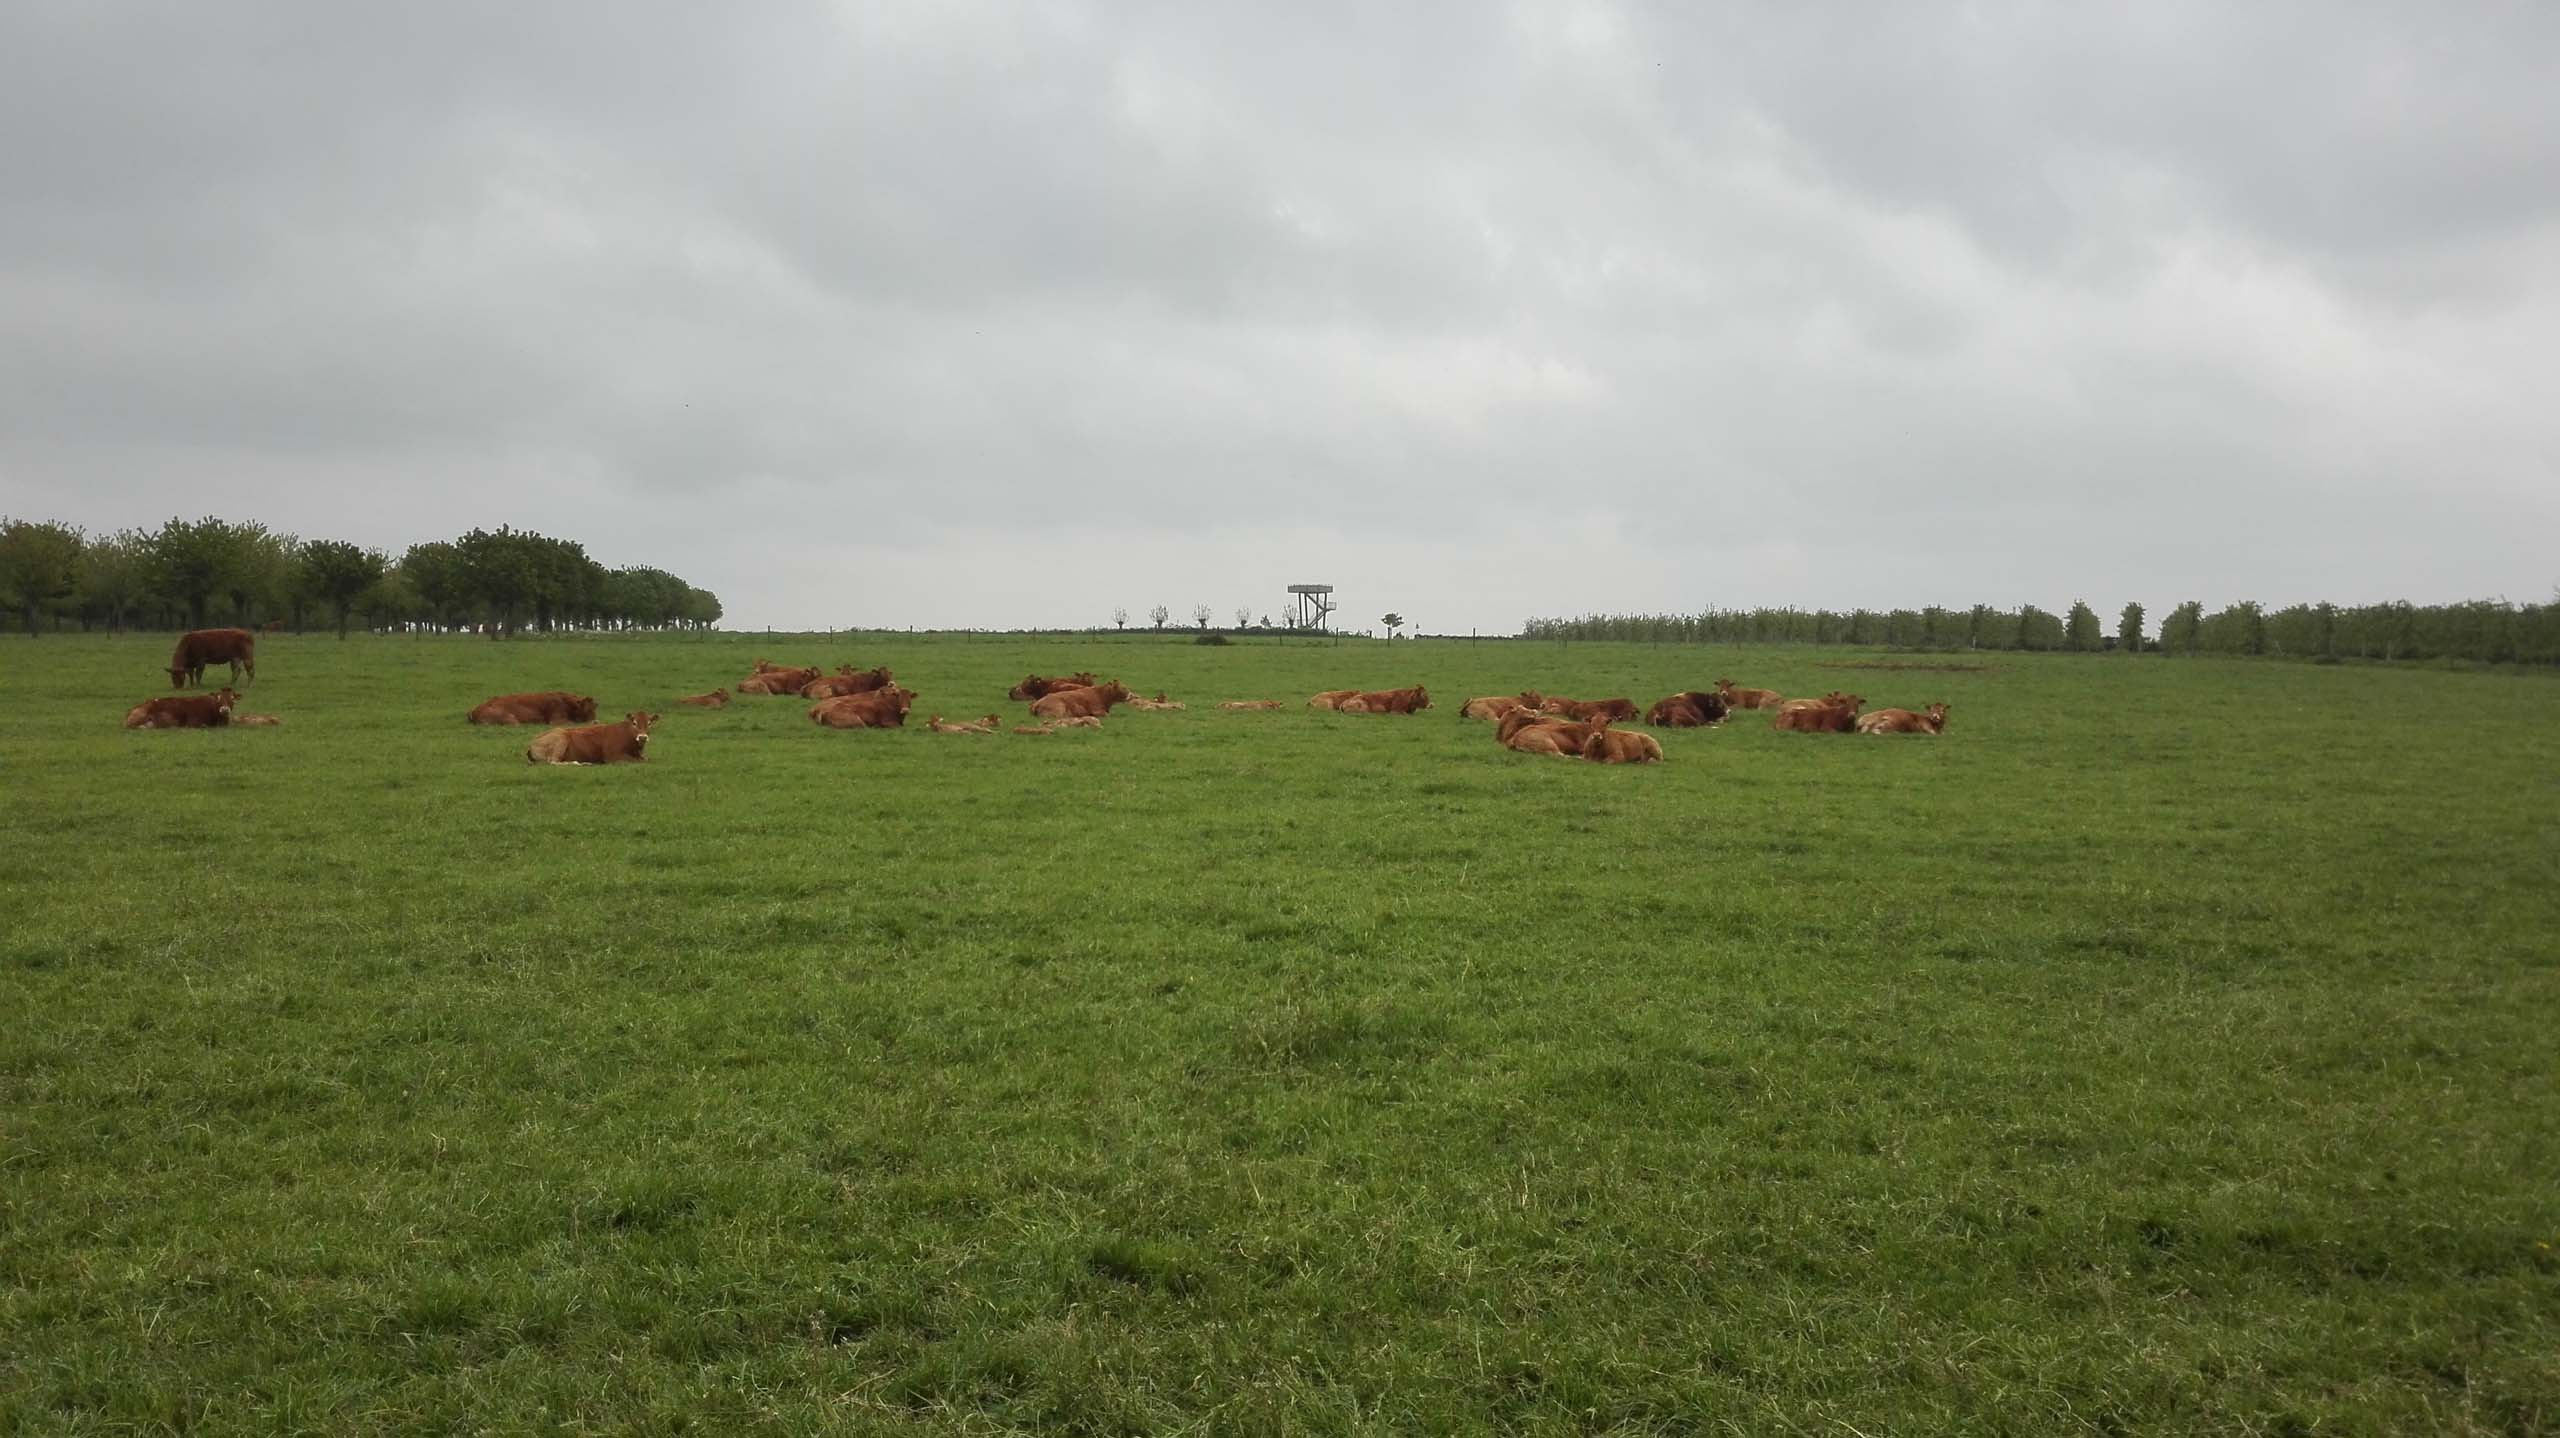 koeien n de wei